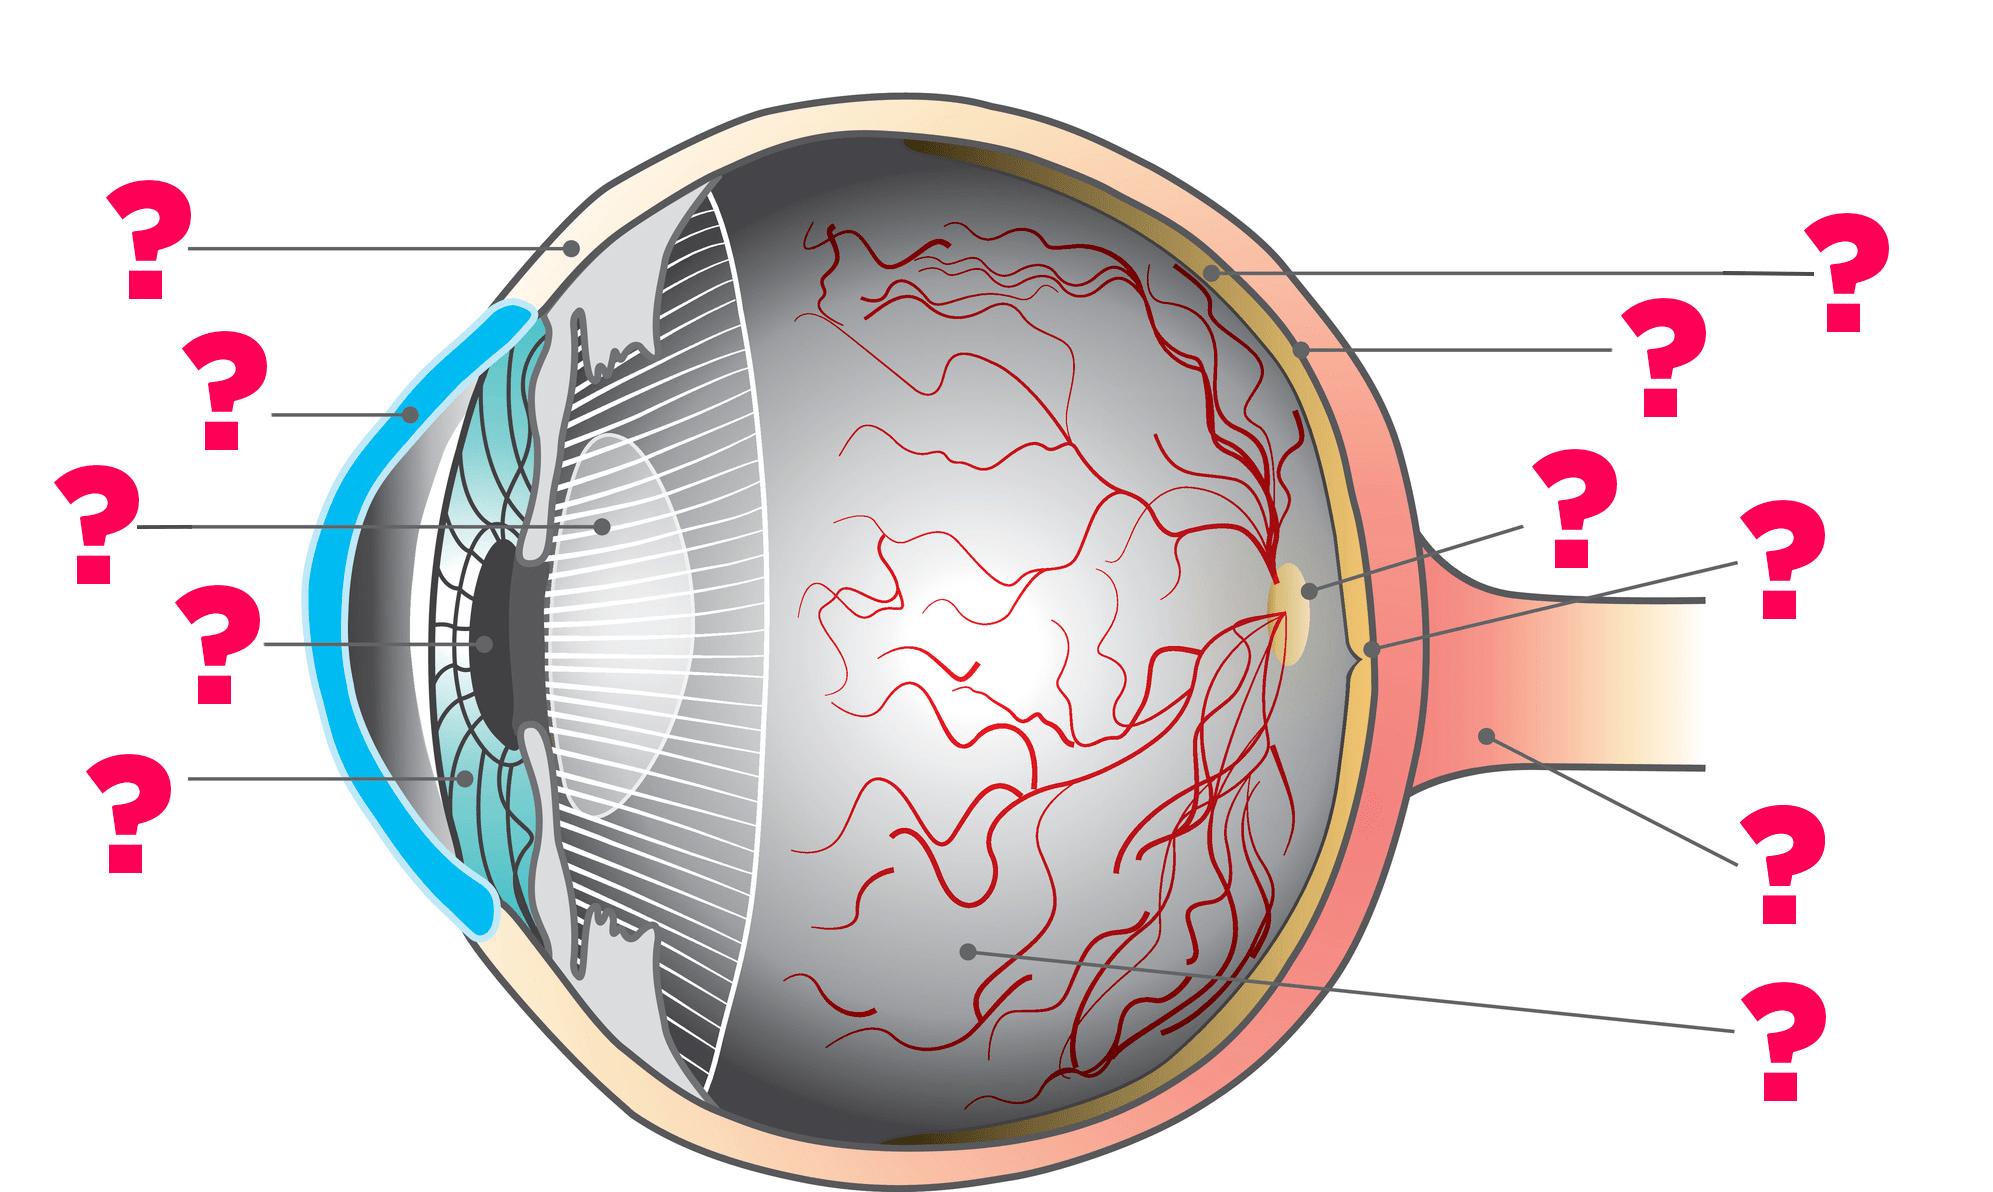 medium resolution of eye diagram quiz game ngs wiring diagram cerebral cortex diagram quiz can you get 11 11